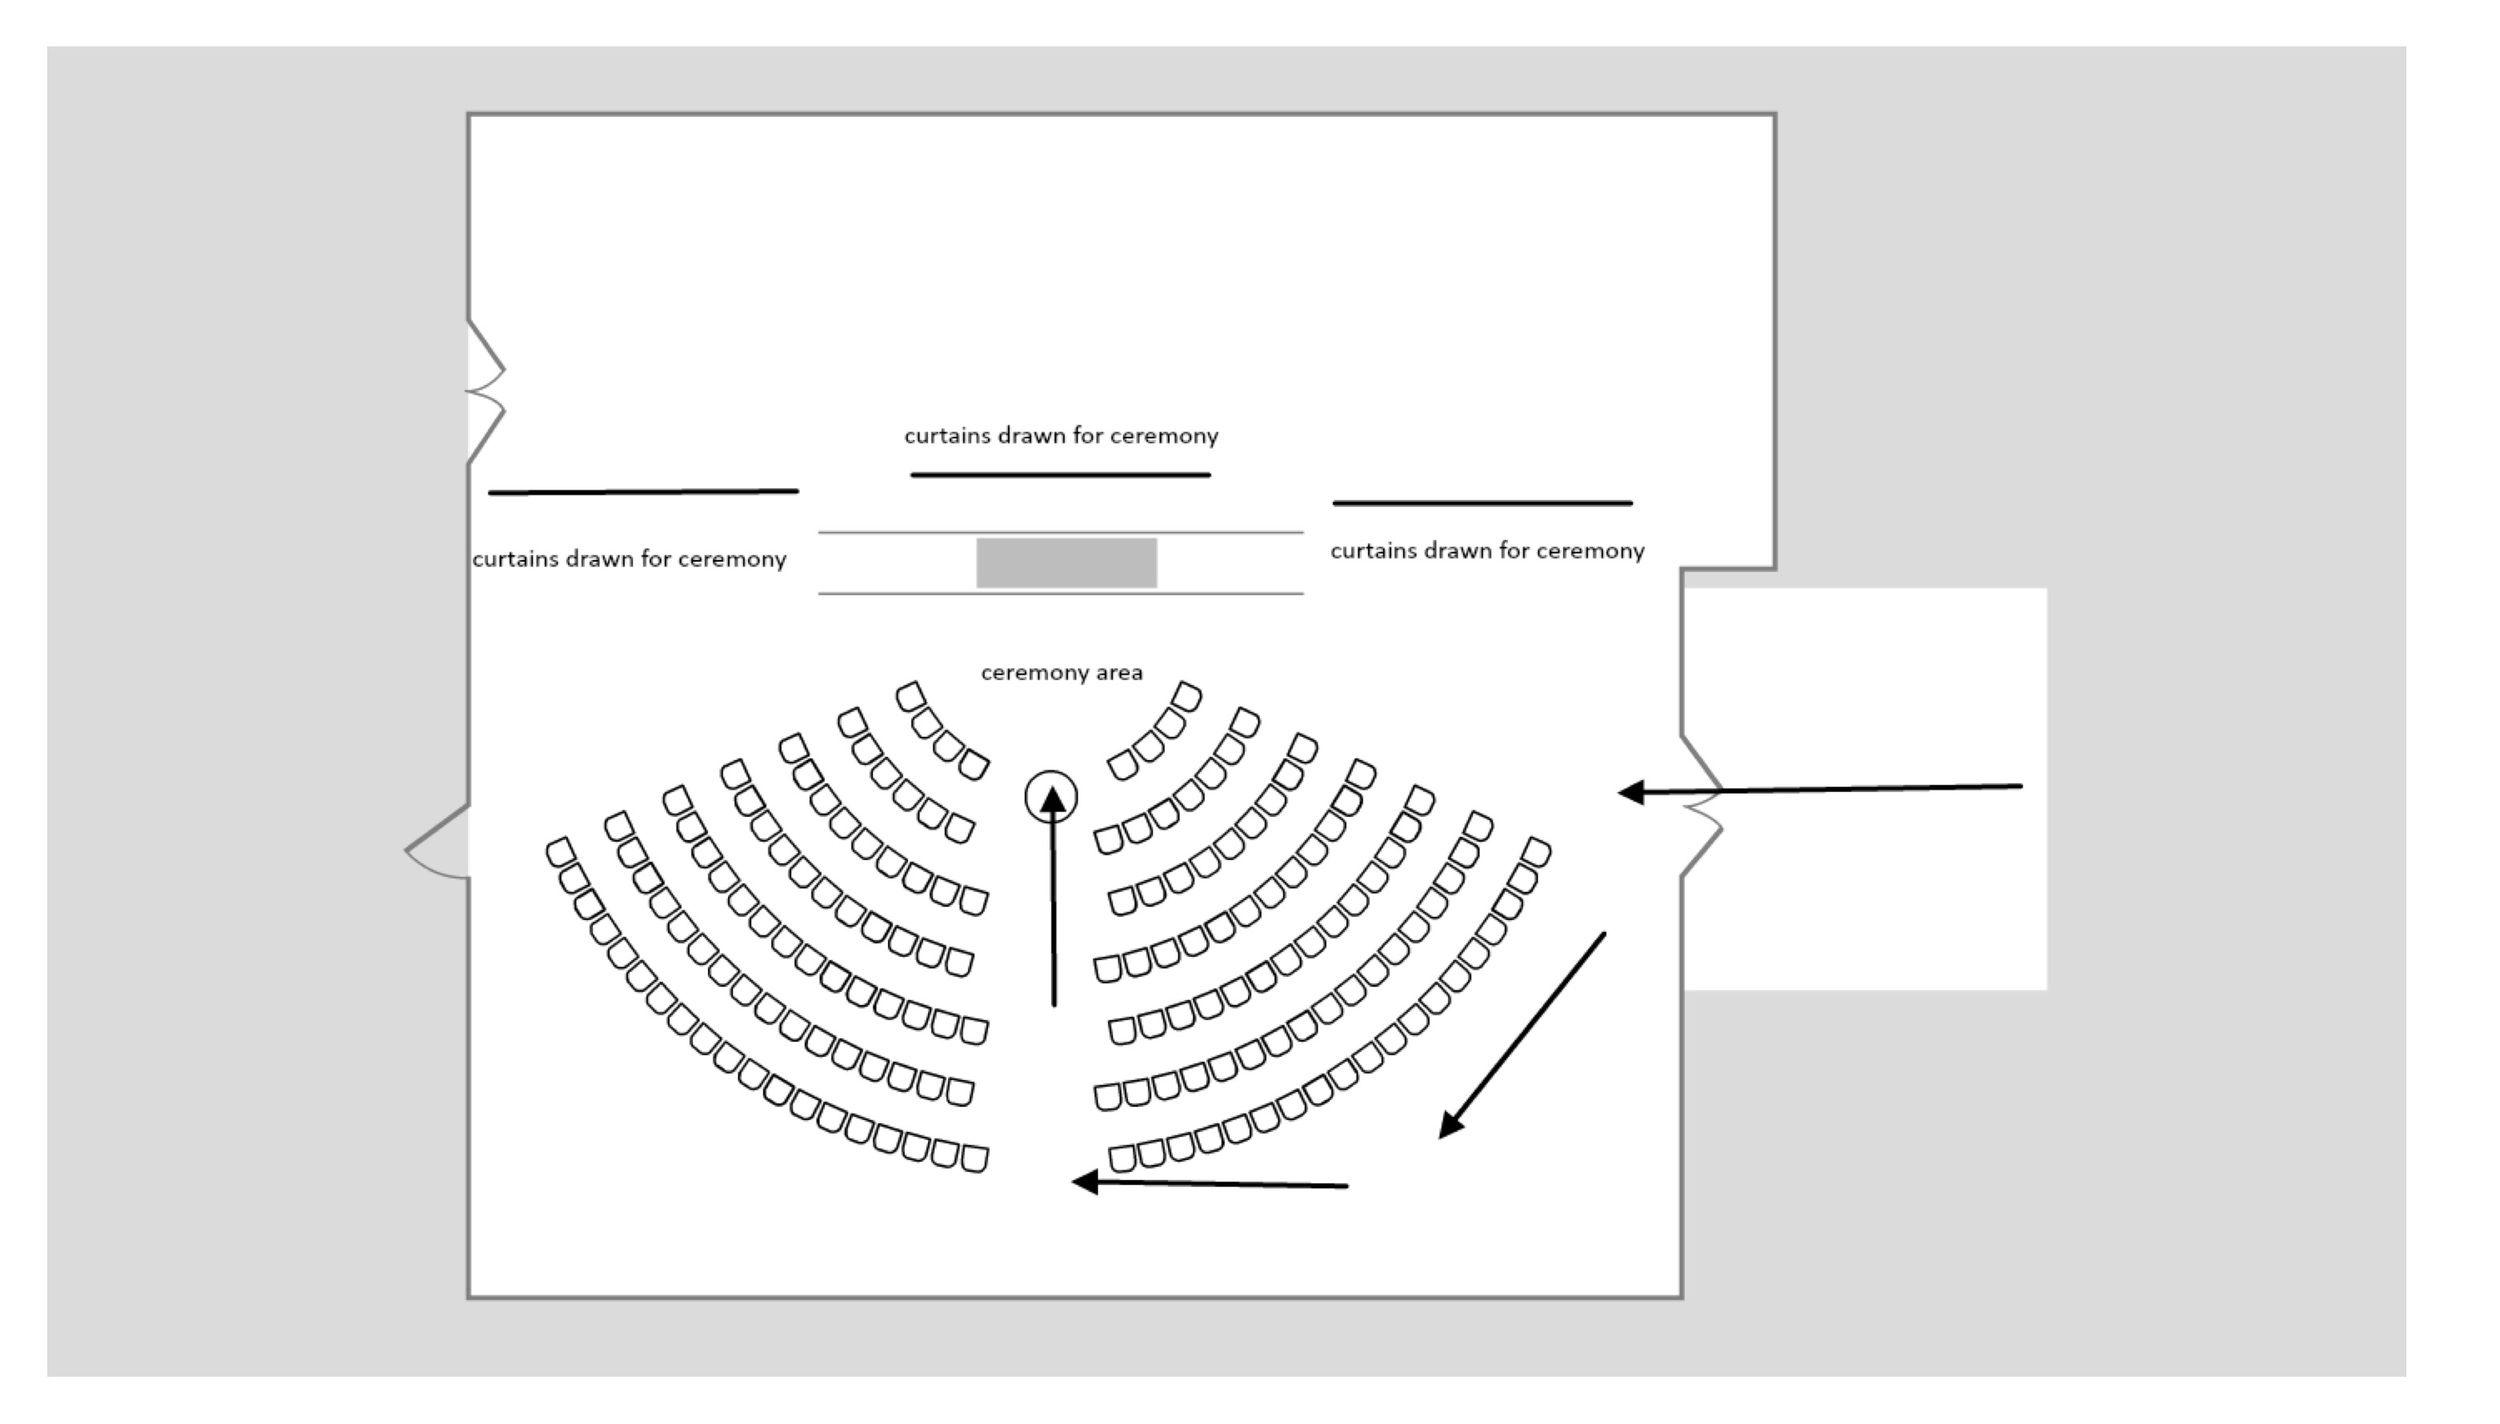 Chair setup Seating chart wedding template, Seating